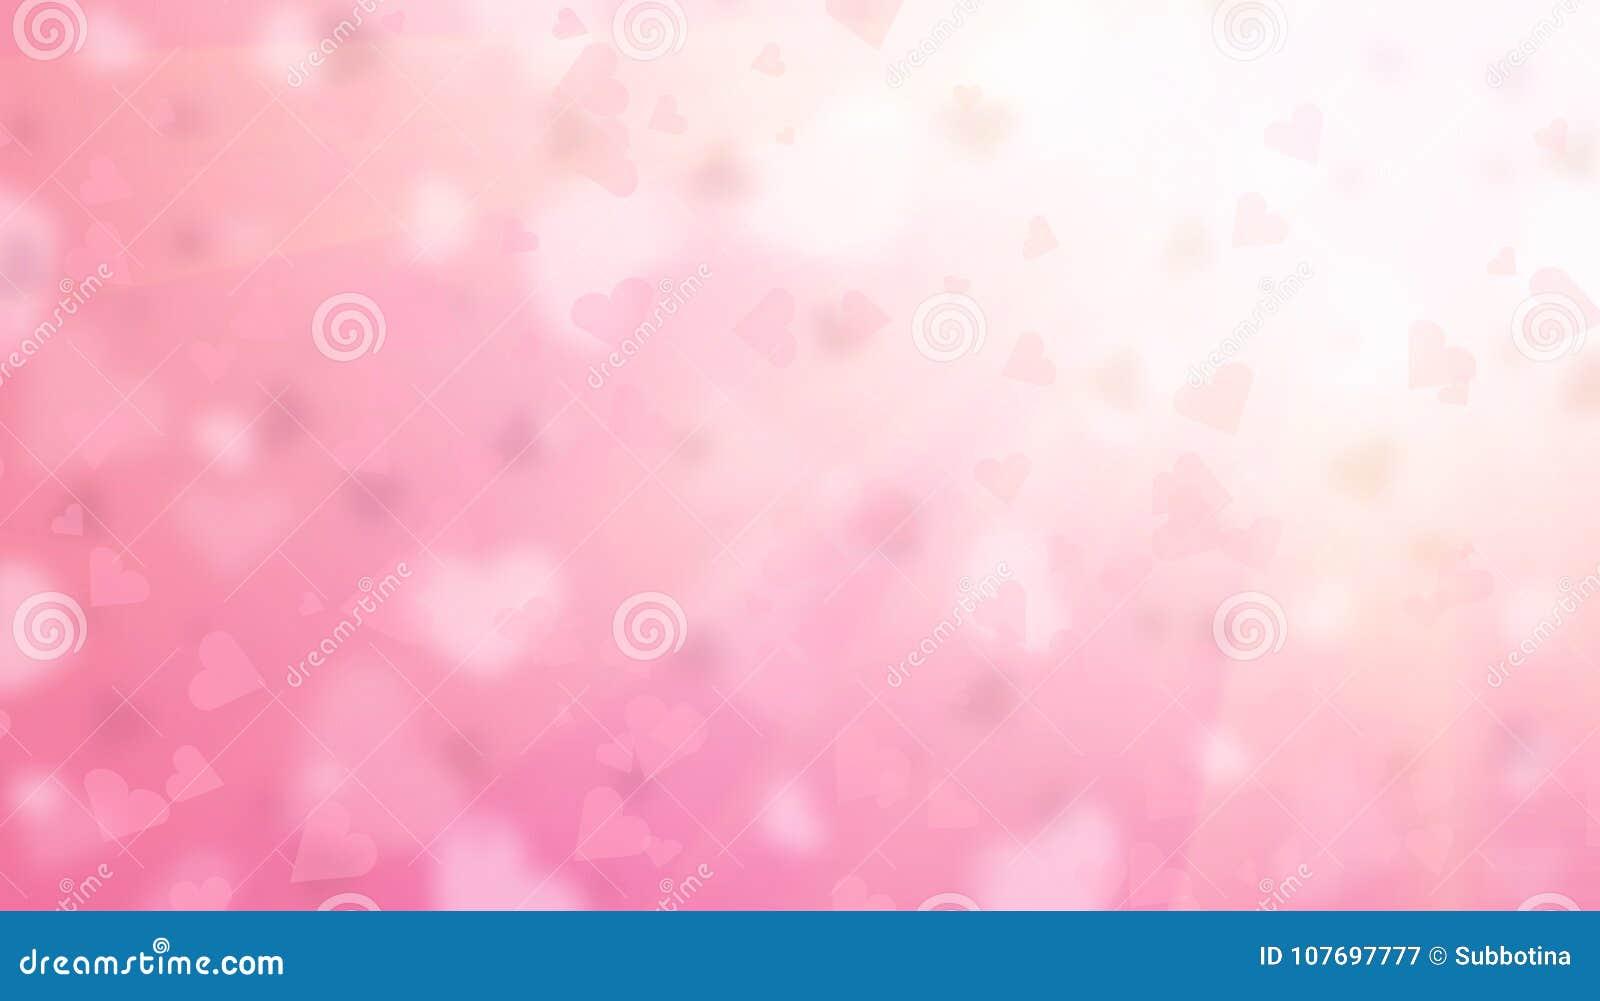 Предпосылка дня Валентайн Абстрактный розовый фон праздника сердец